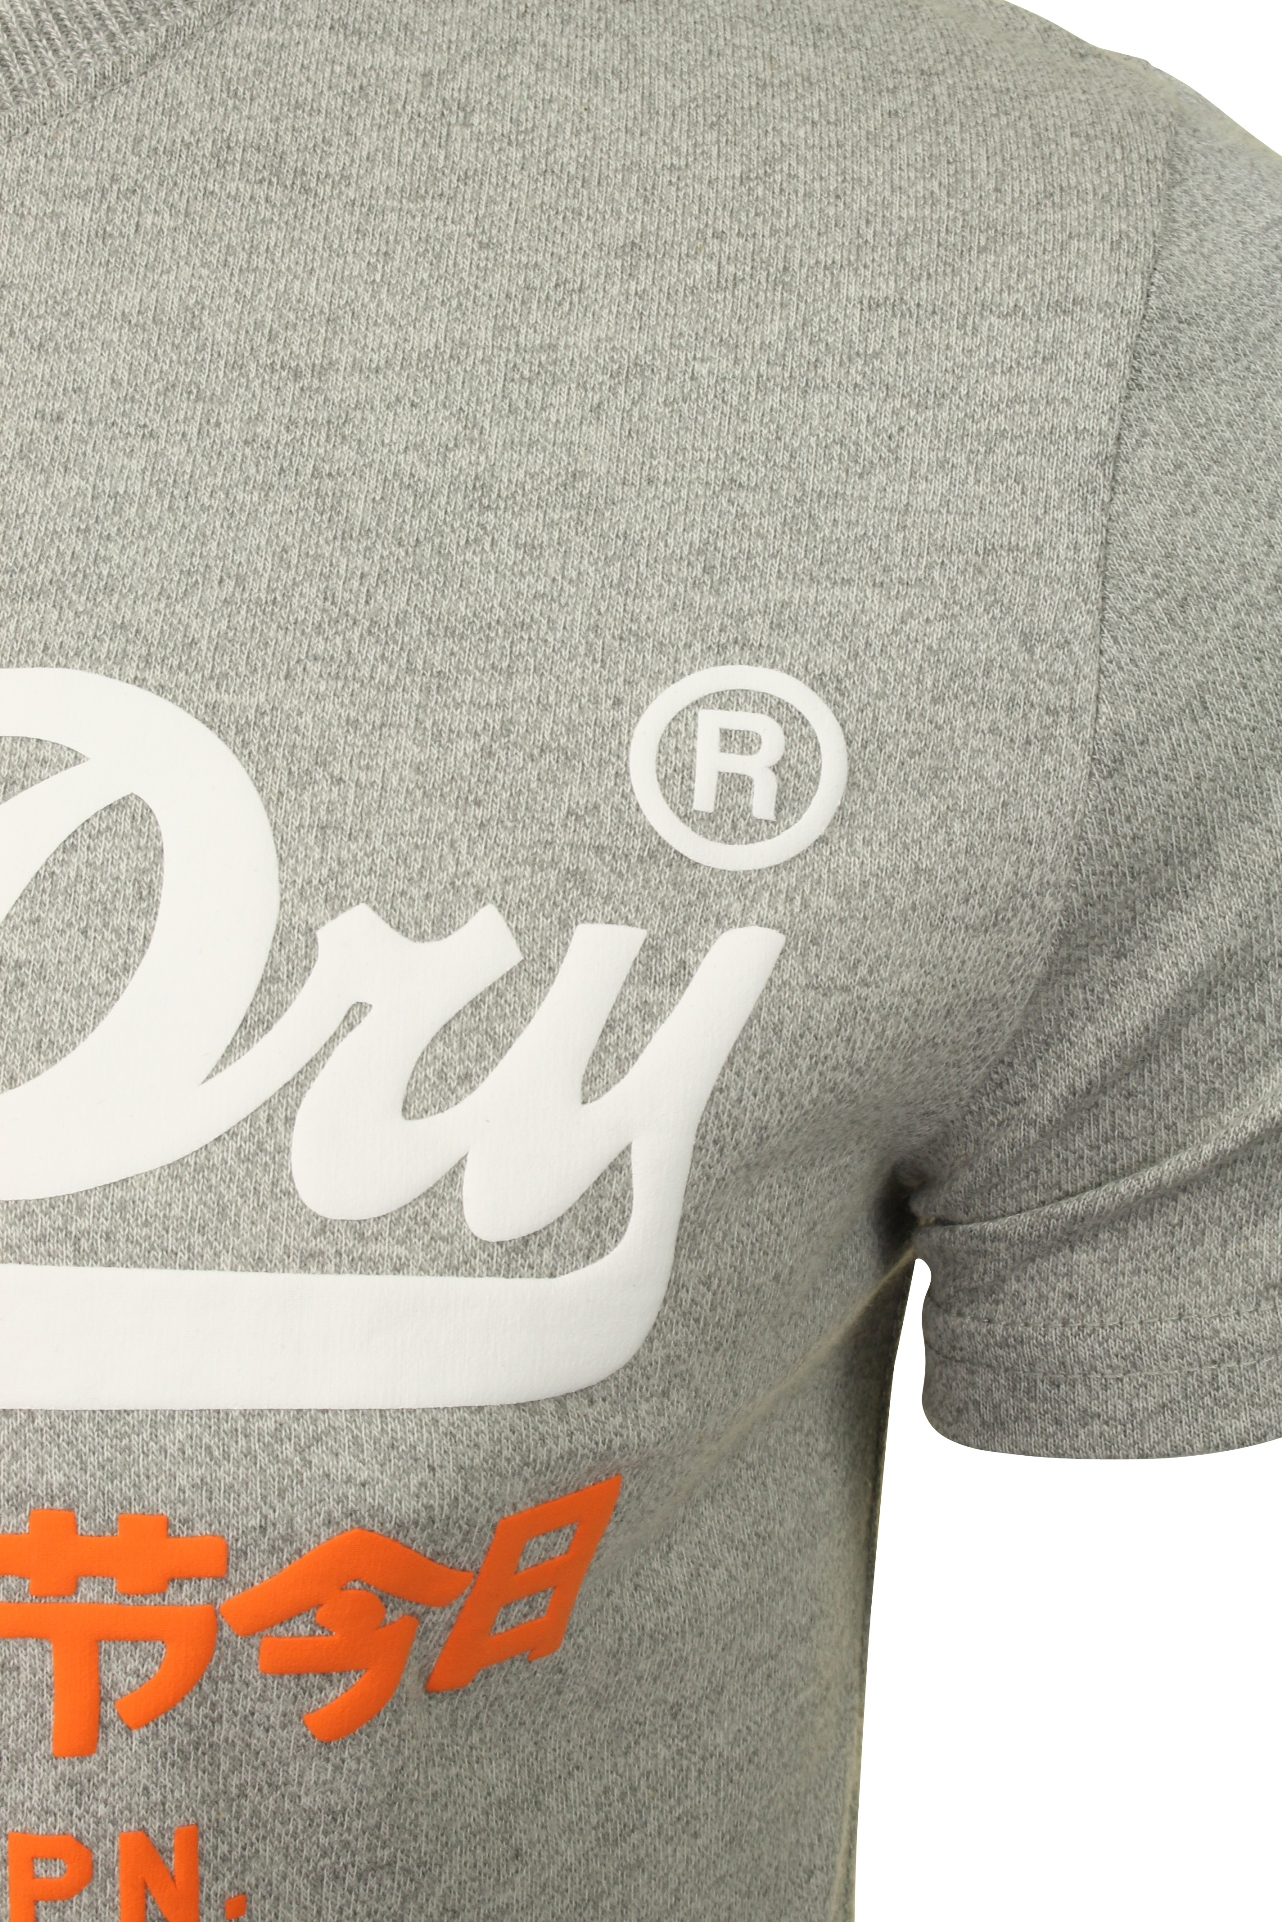 Superdry-Mens-039-Vintage-Logo-039-T-Shirt thumbnail 6